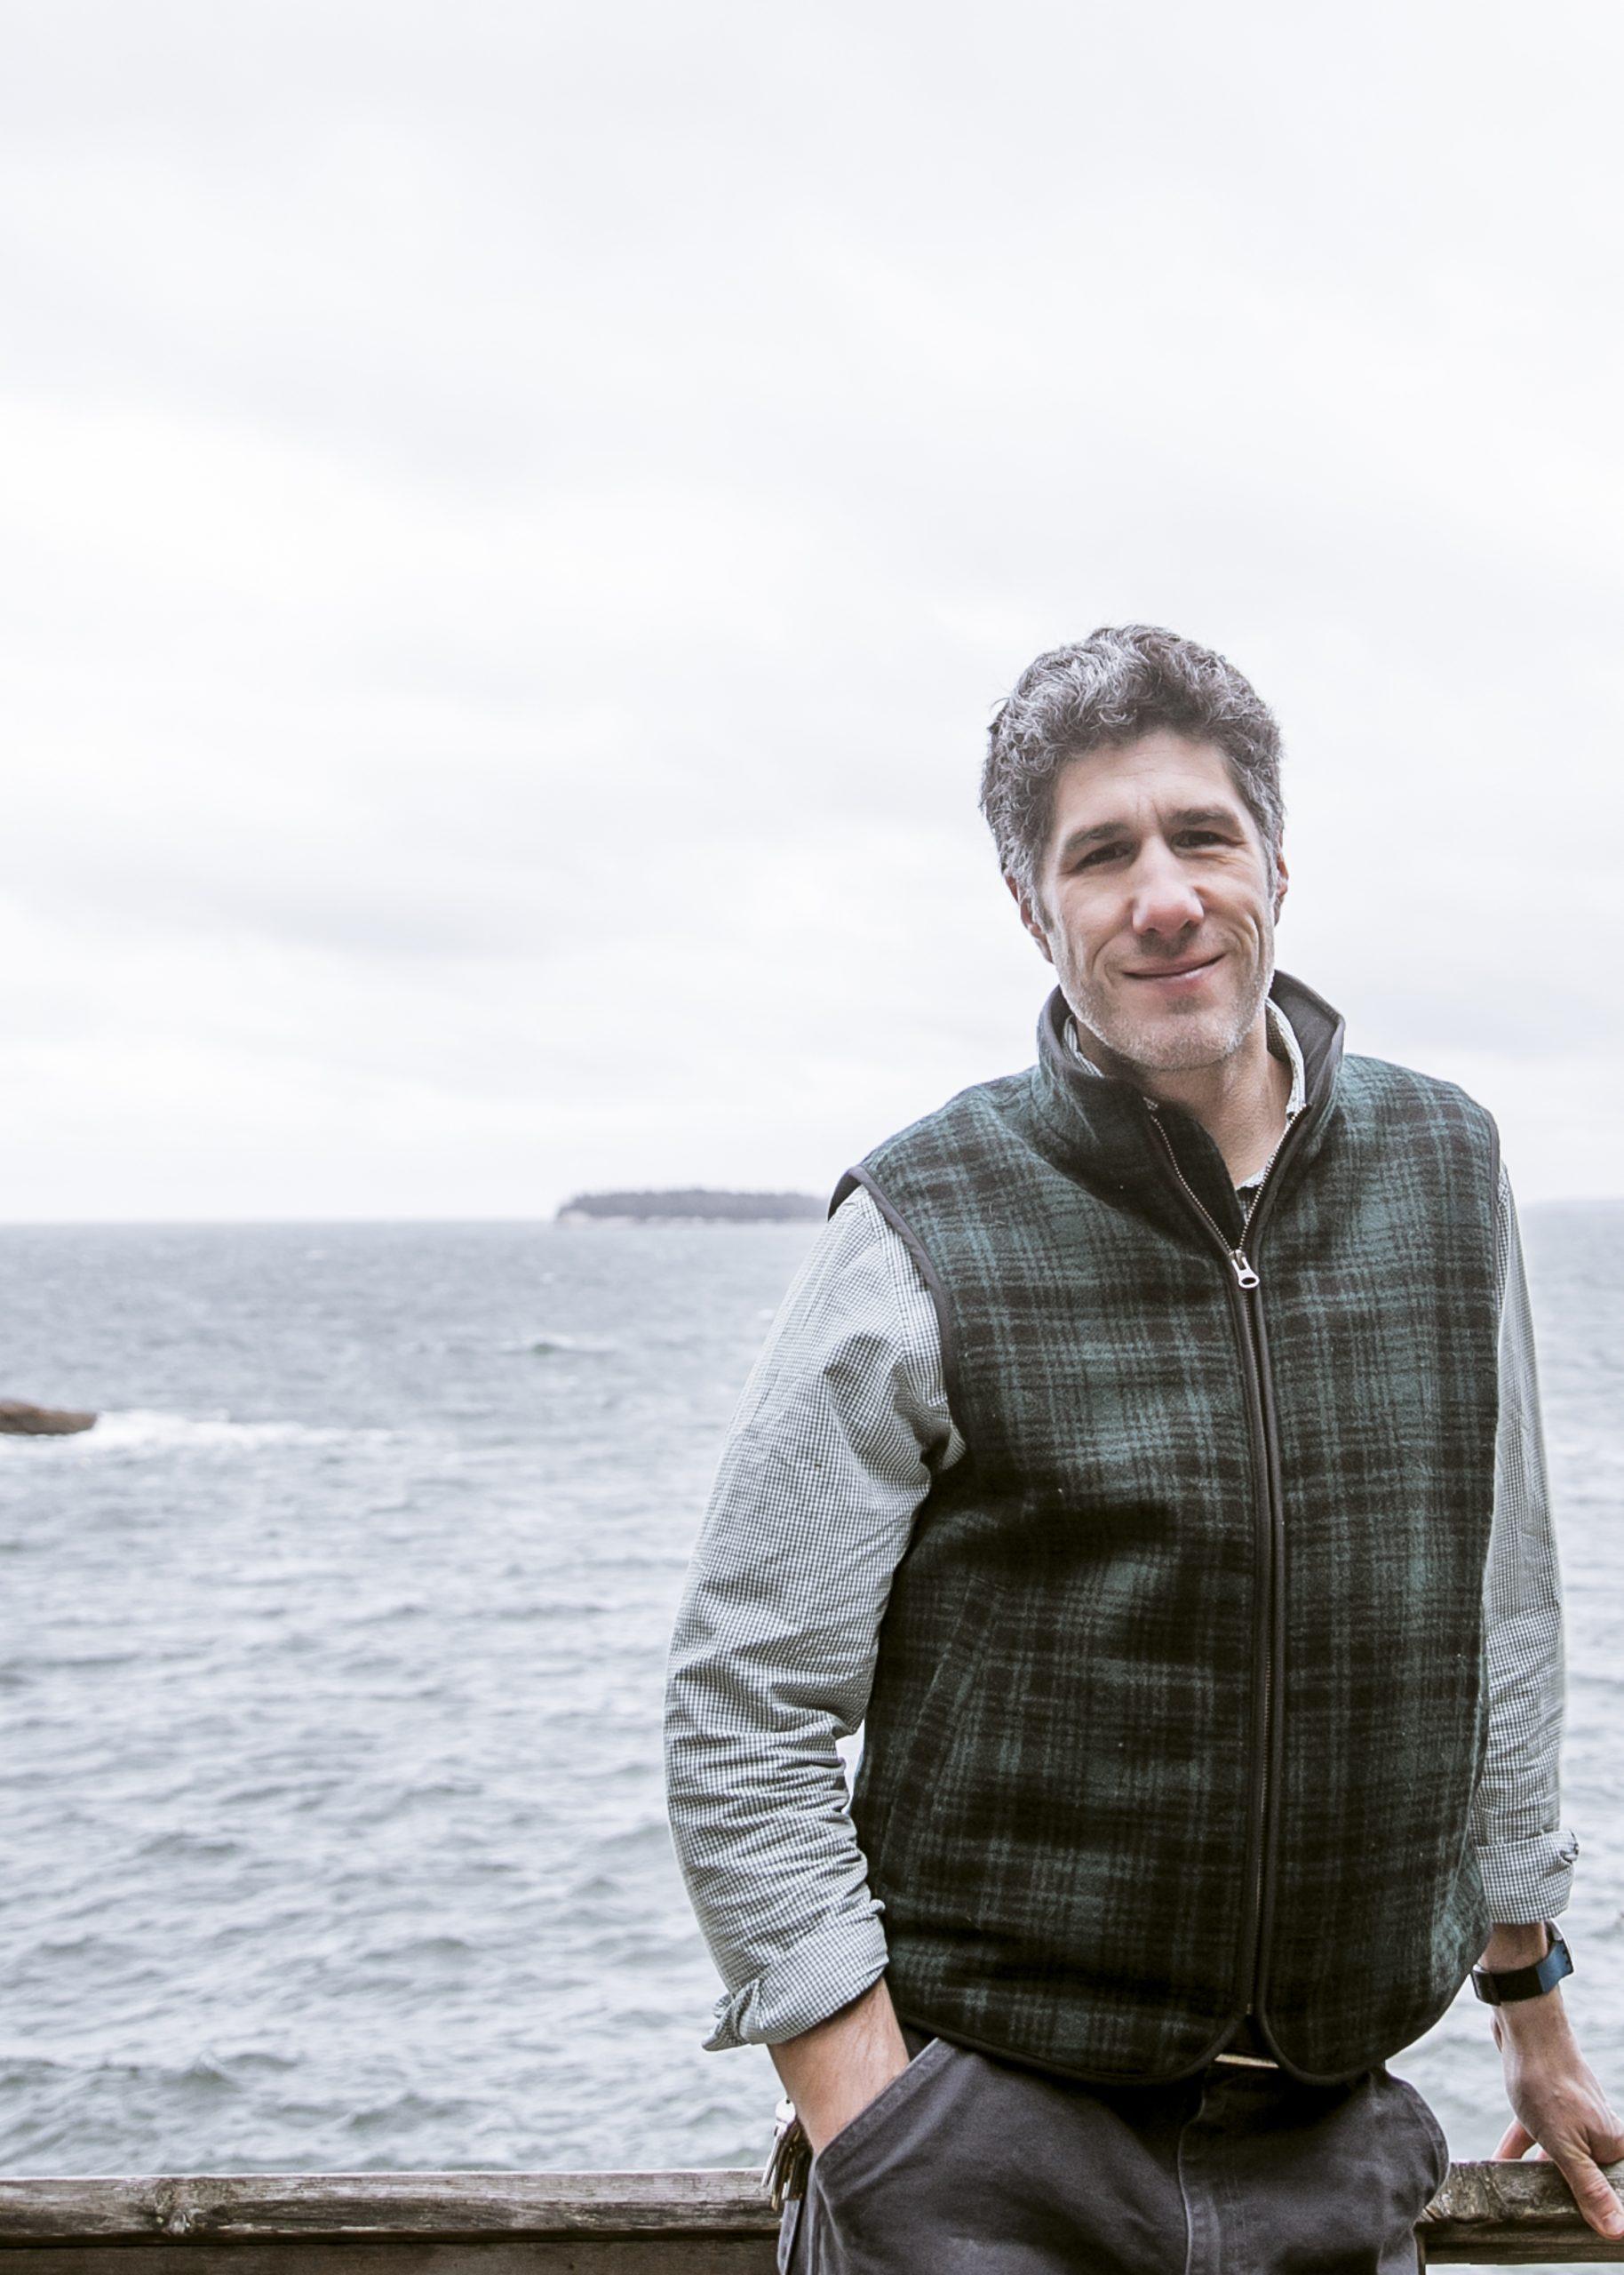 Paul Sacaridiz, Executive Director Haystack Mountain School of Crafts